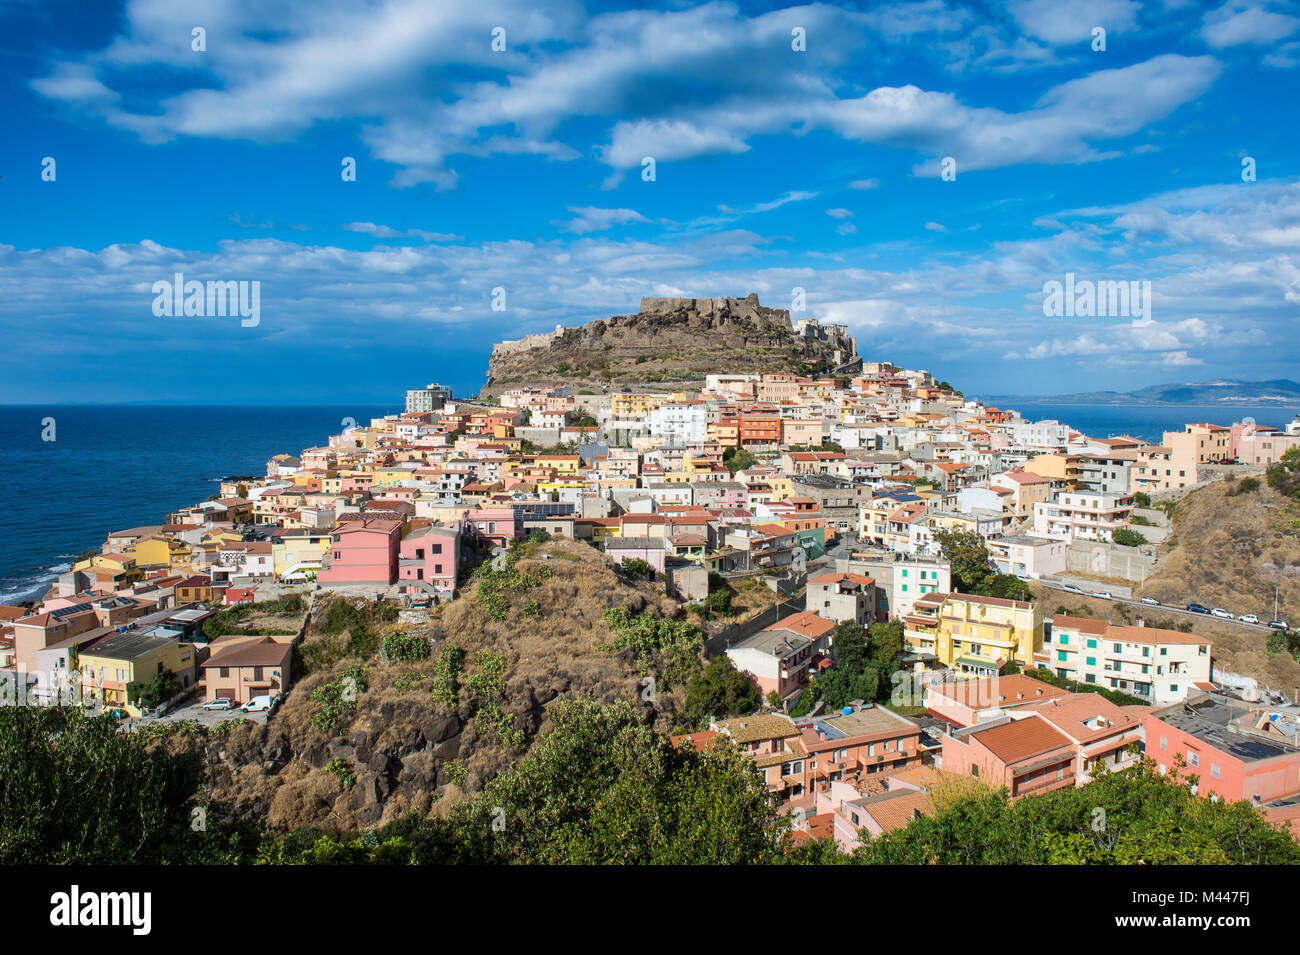 Blicken Sie über Castelsardo, Sardinien, Italien Stockbild